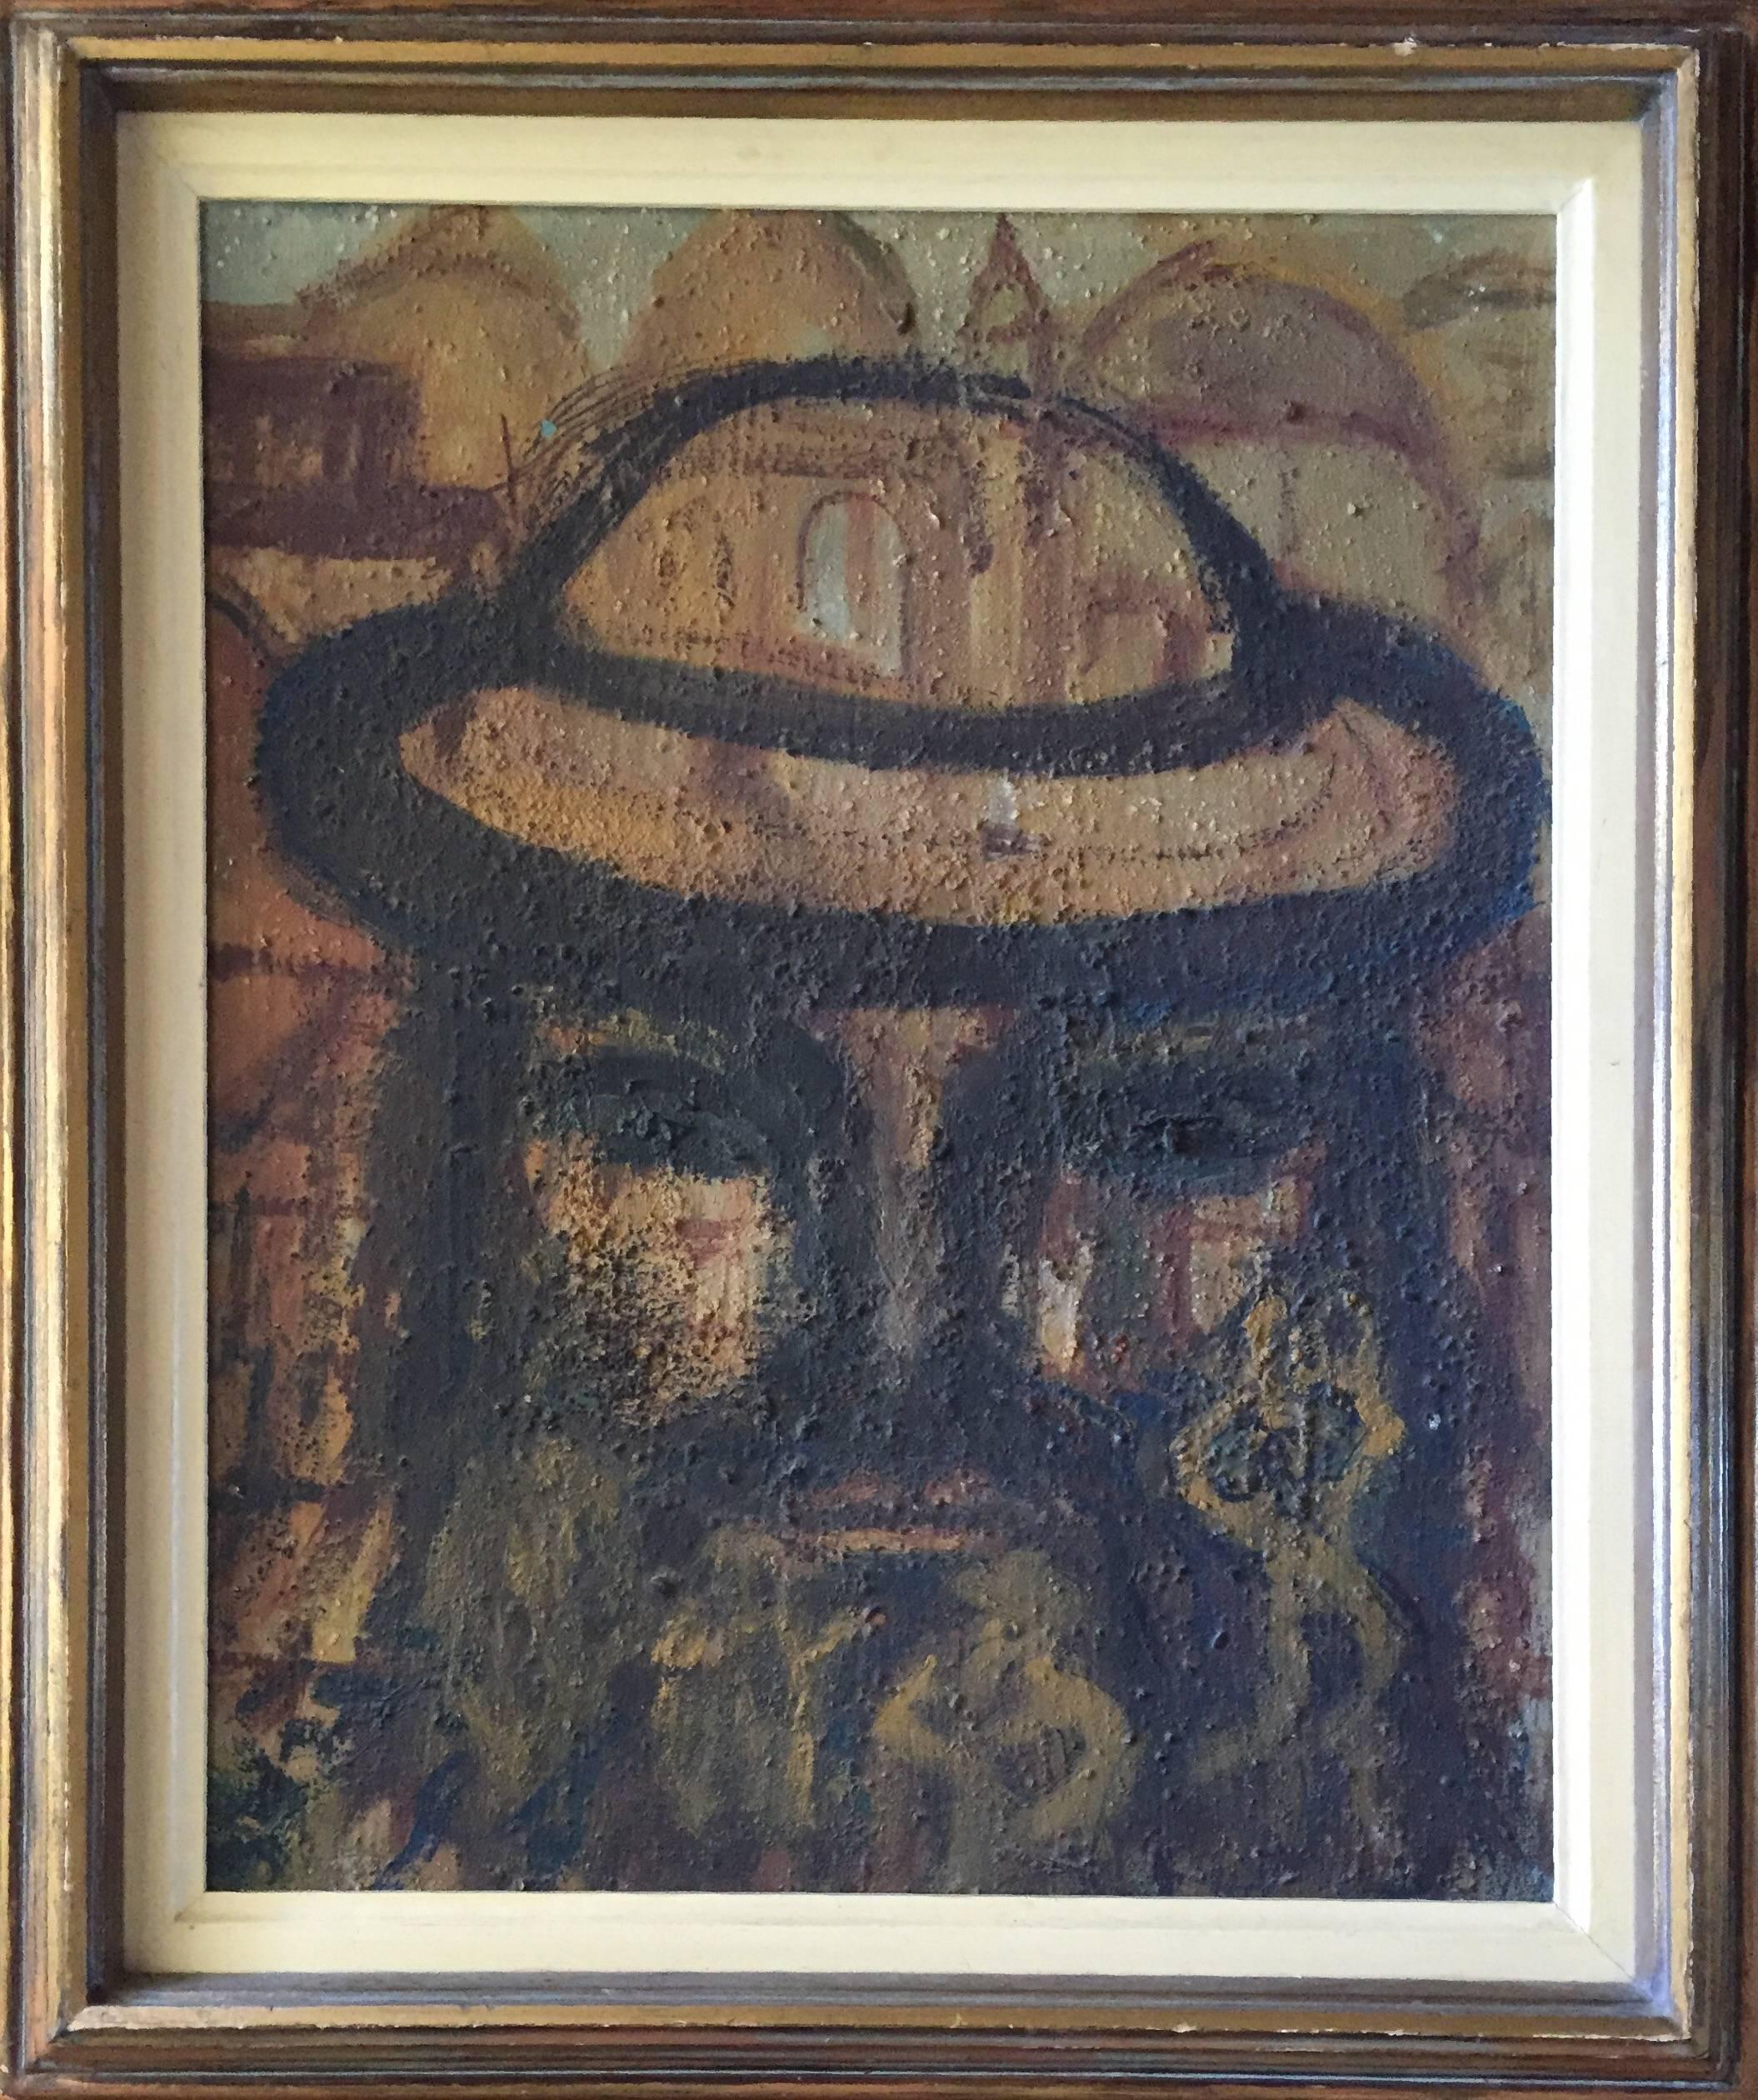 Rabbi in Old Jerusalem Painting